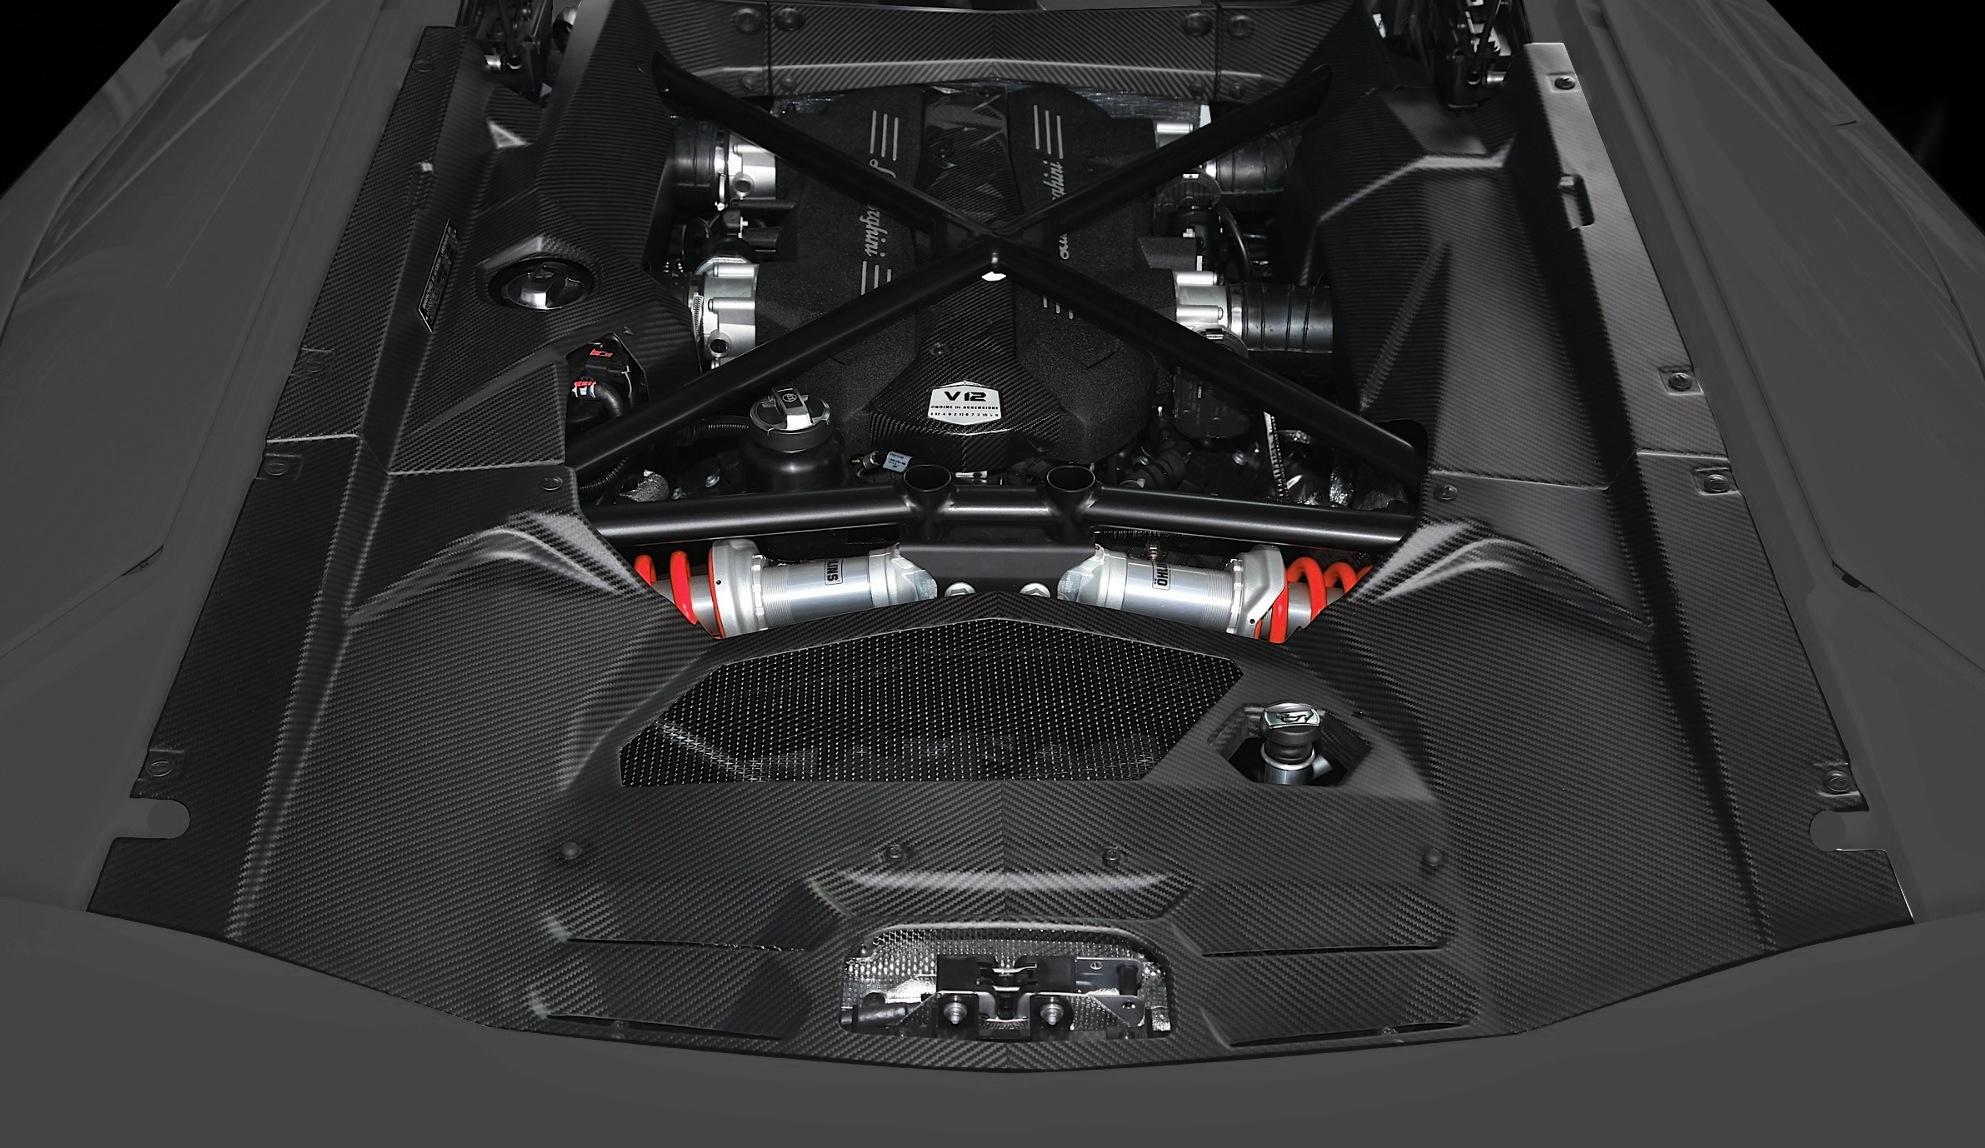 Dmc Molto Veloce Carbon Fiber Body Kit For The Lamborghini Aventador